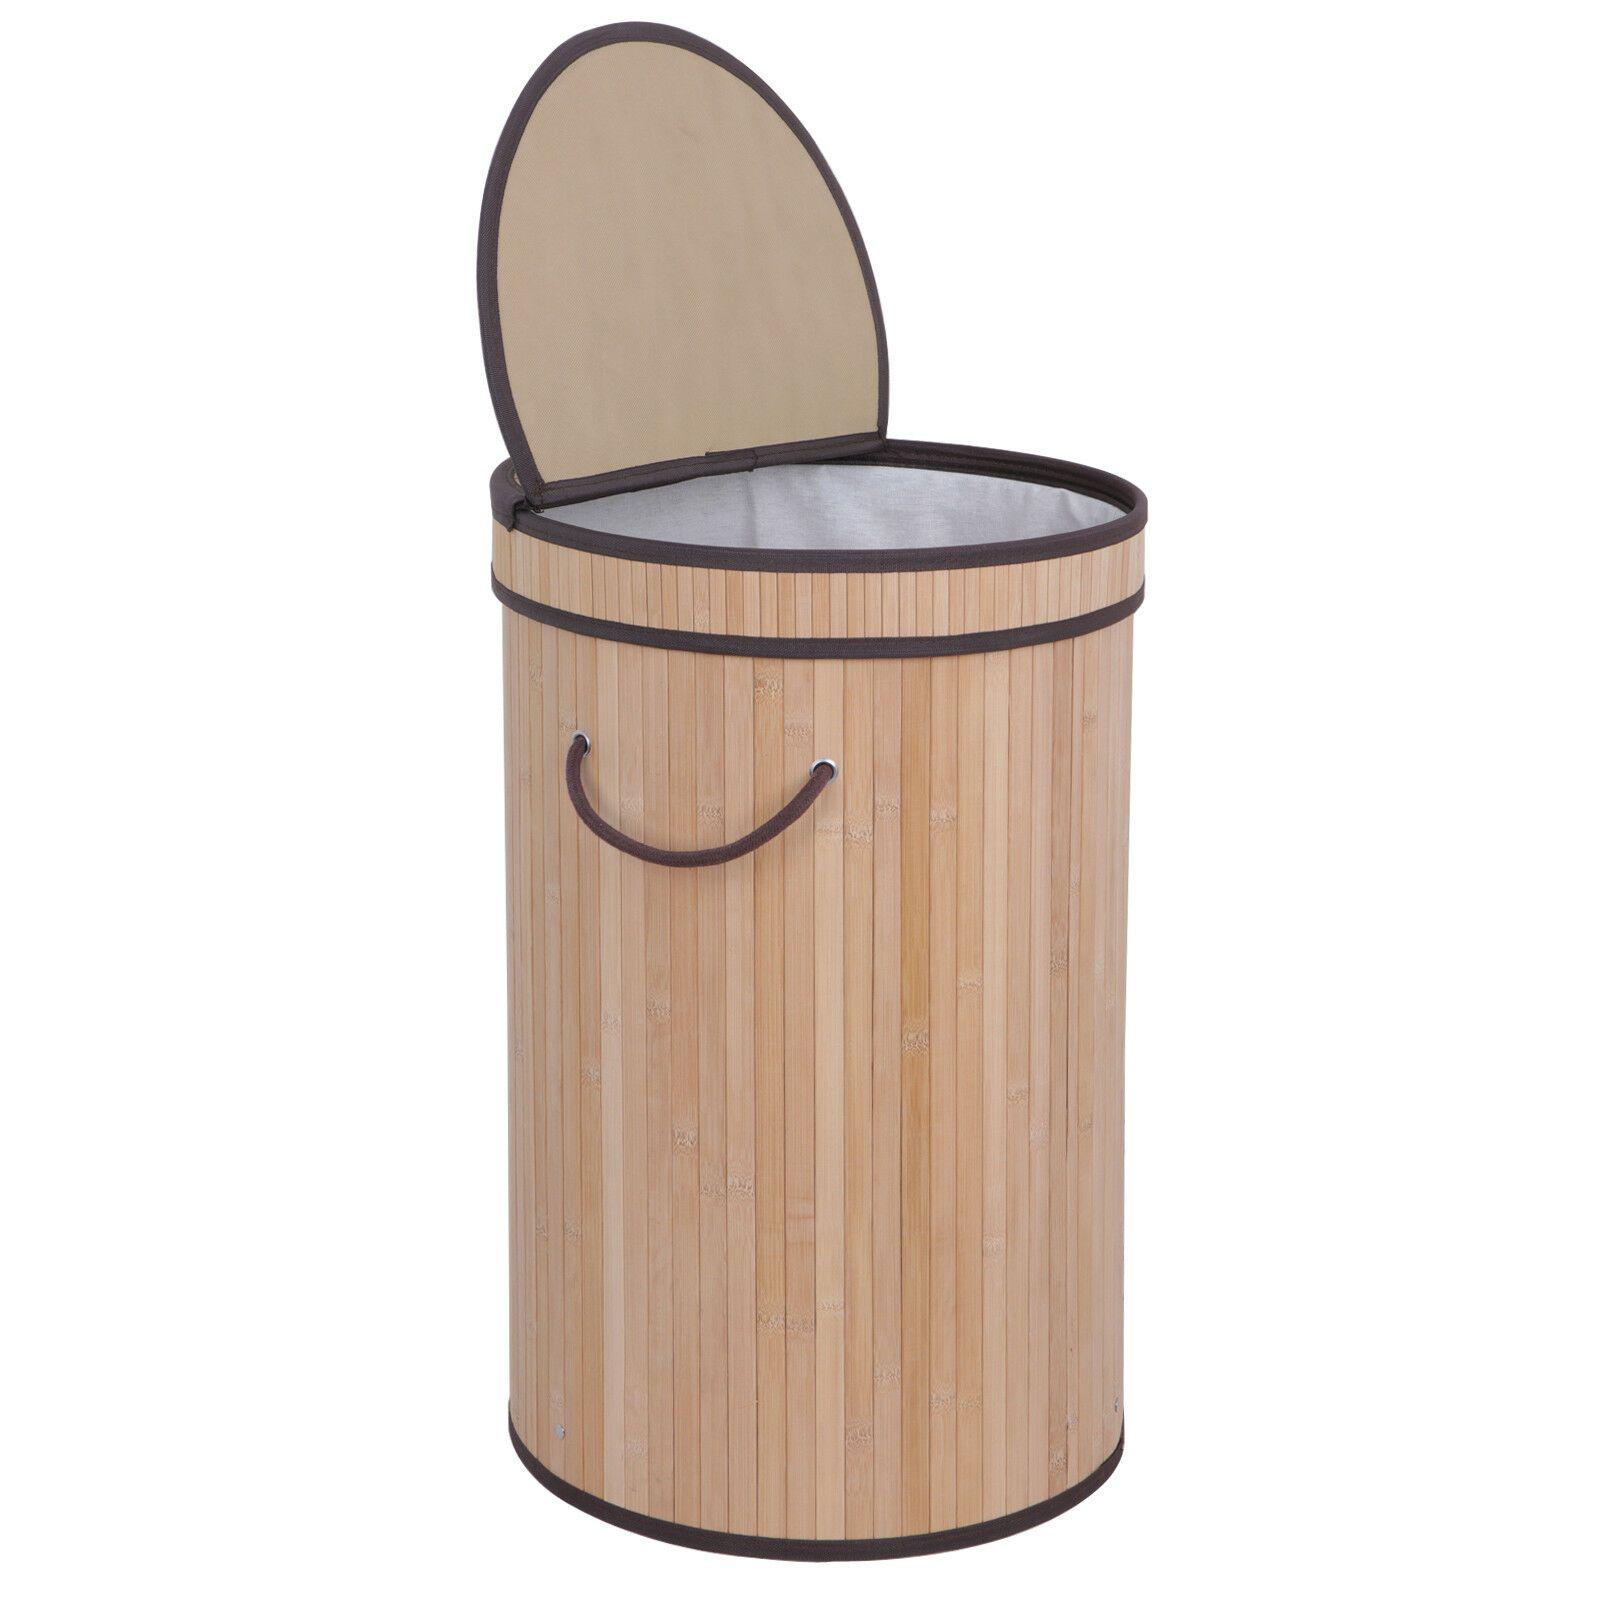 Bamboo Hamper Laundry Basket Washing Cloth Storage Bin Bag W Lid